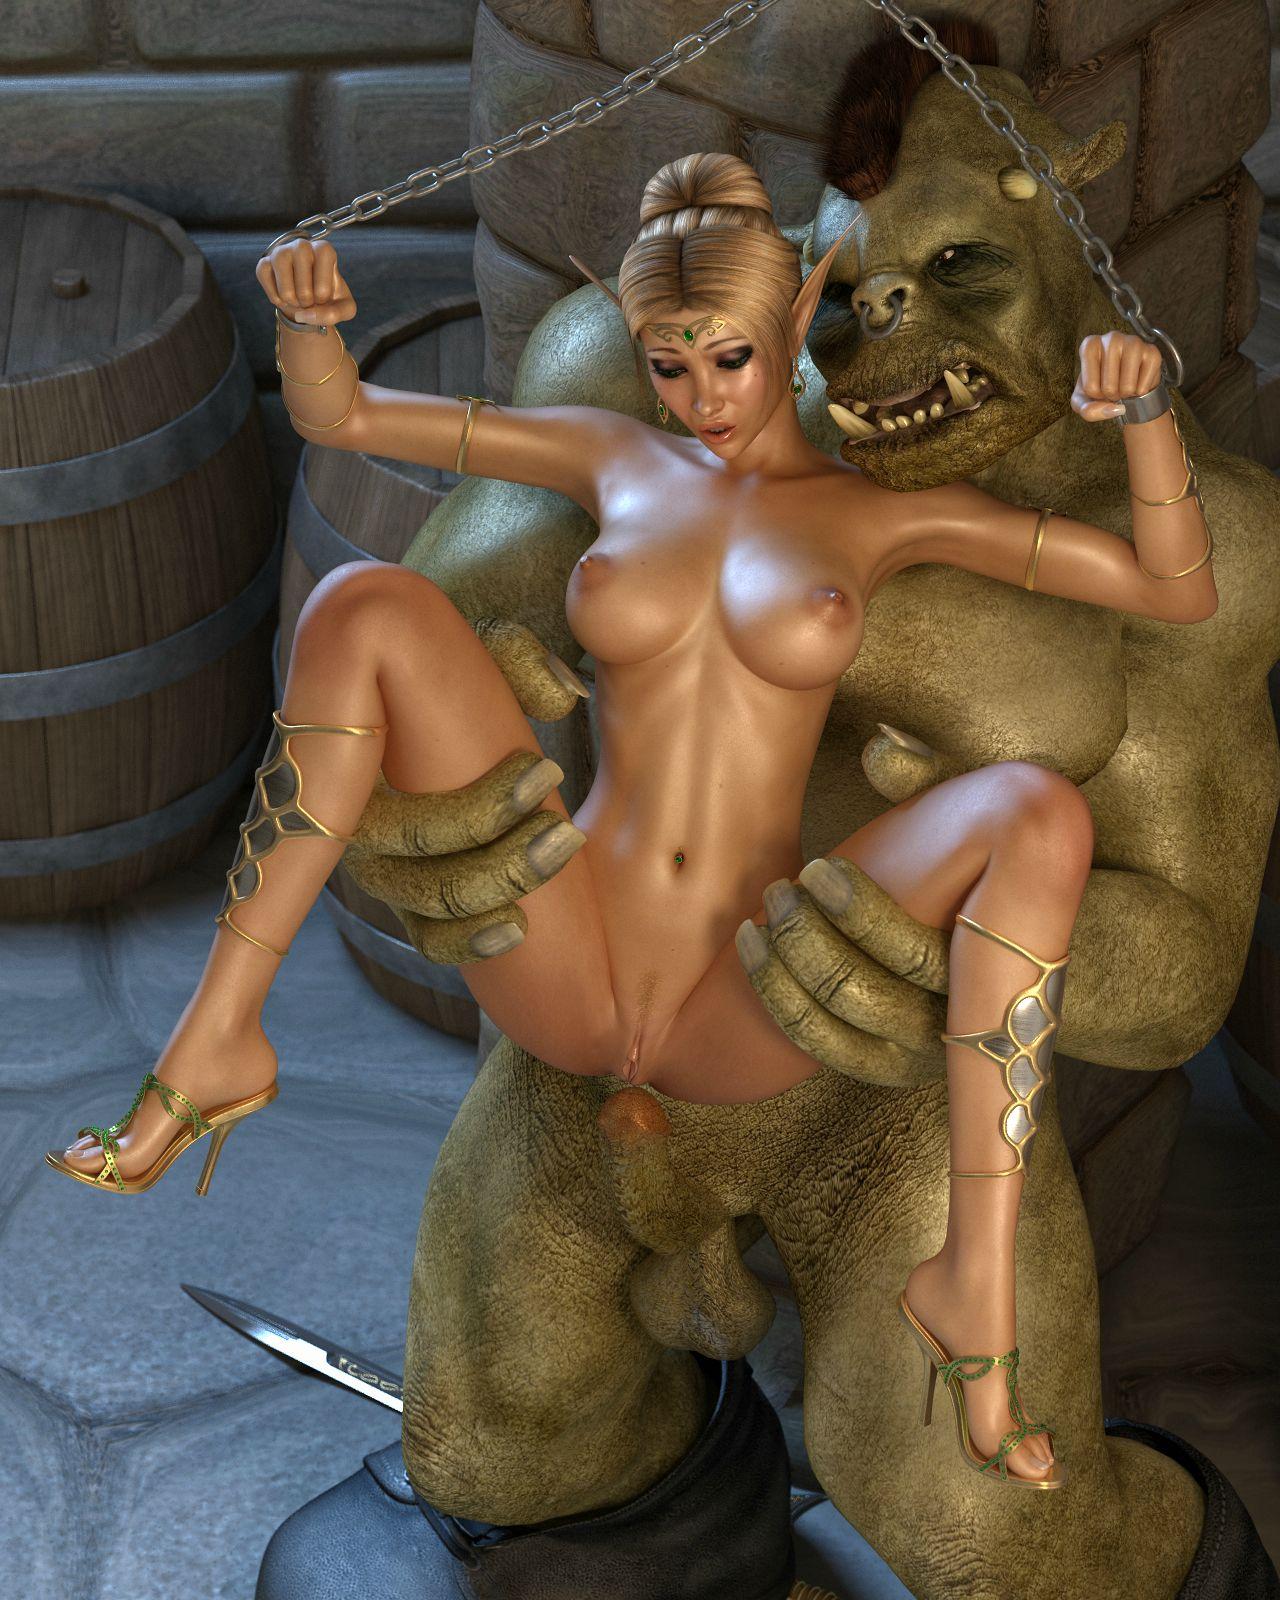 3d-porn-videos-free-xxx-sex-youpron